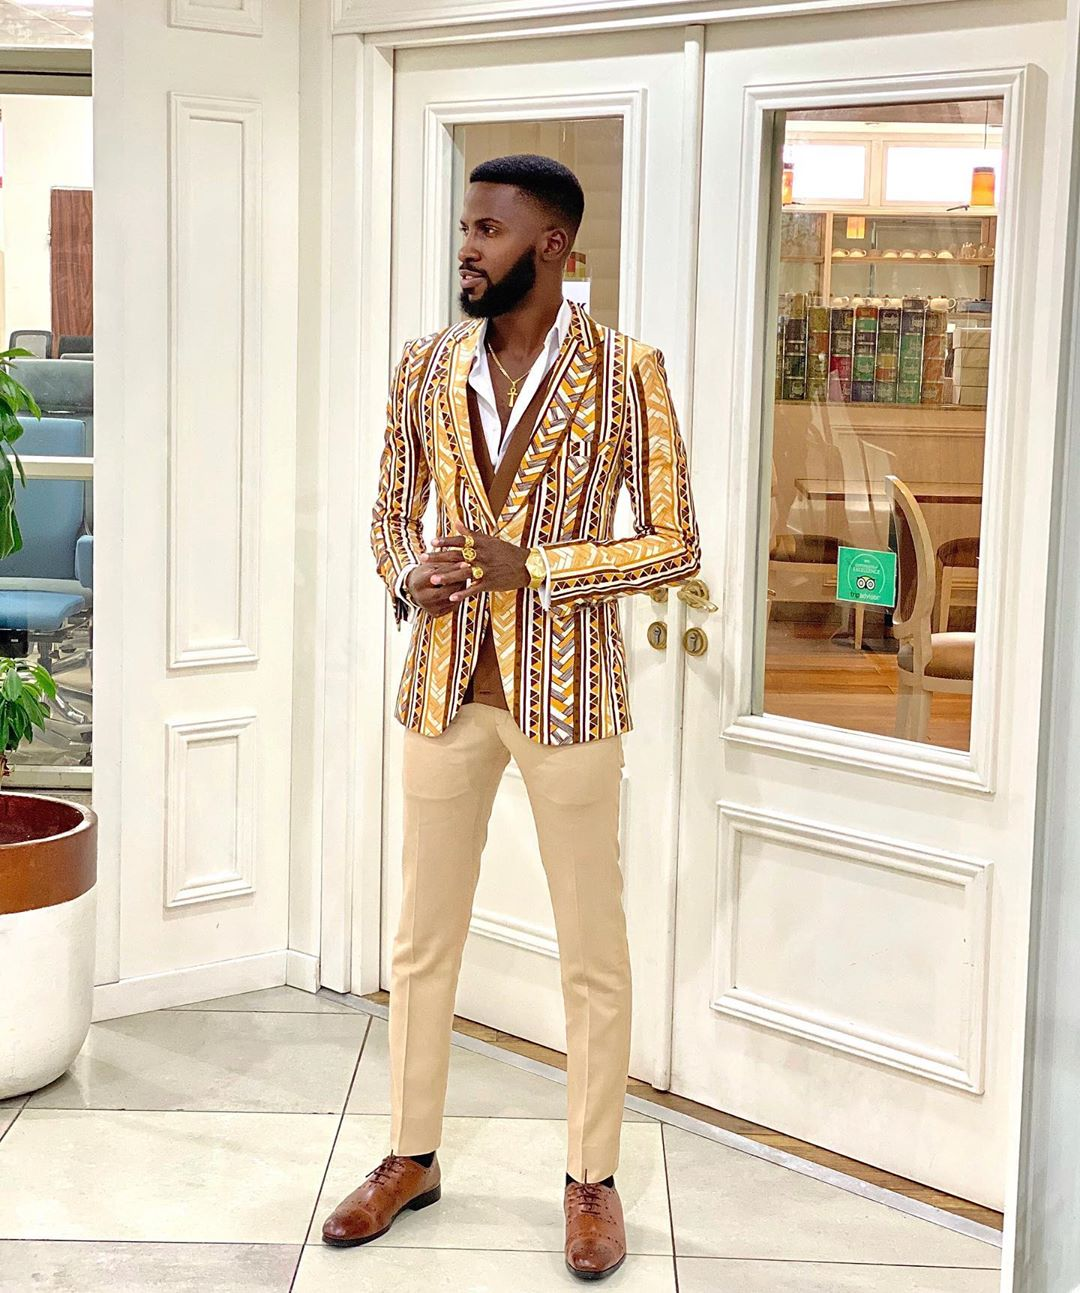 akin famine男装时尚影响者拉各斯非洲2020